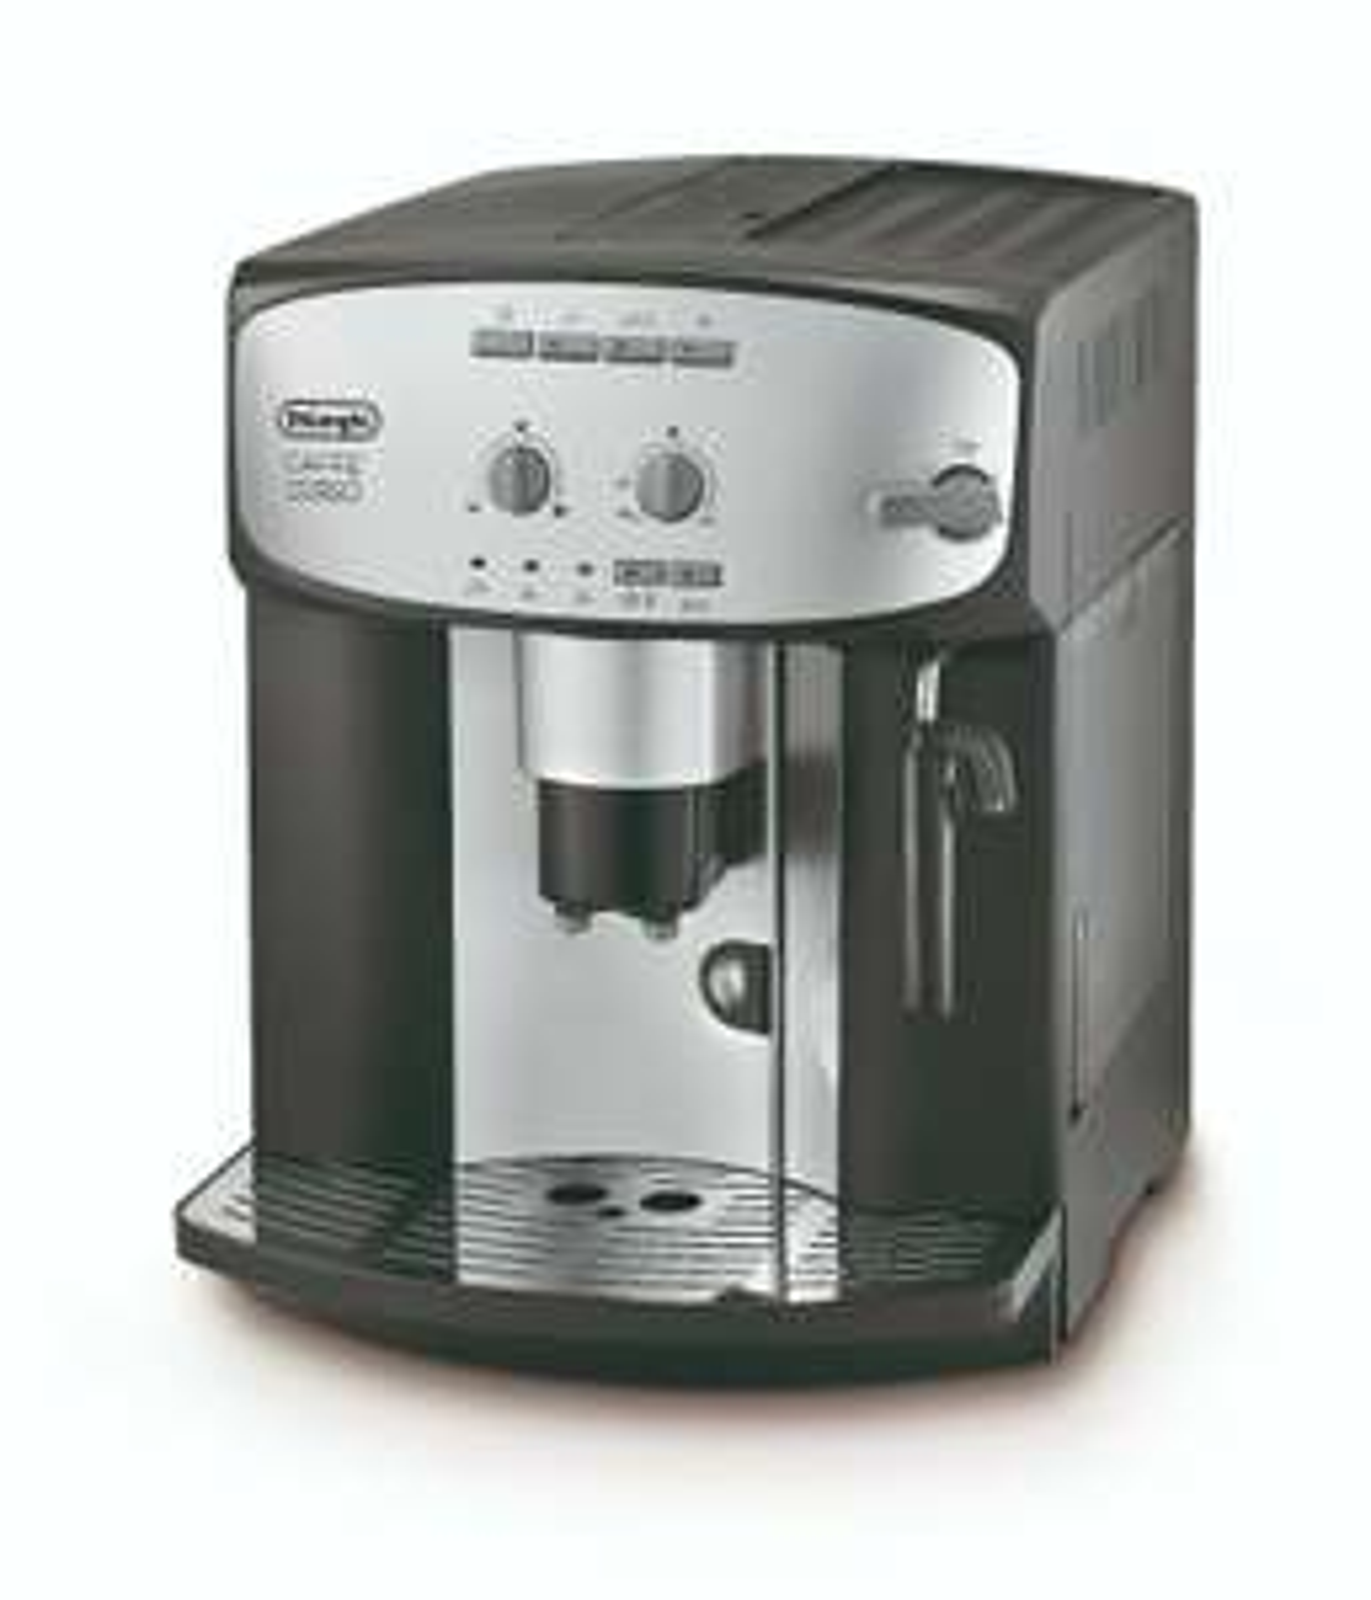 De'Longhi Cafe Corso ESAM2800 Bean to Cup Coffee Machine - Refurb £142.79 / De'Longhi ESAM2600 BTC Coffee Machine £142.79 @ delonghiuk ebay